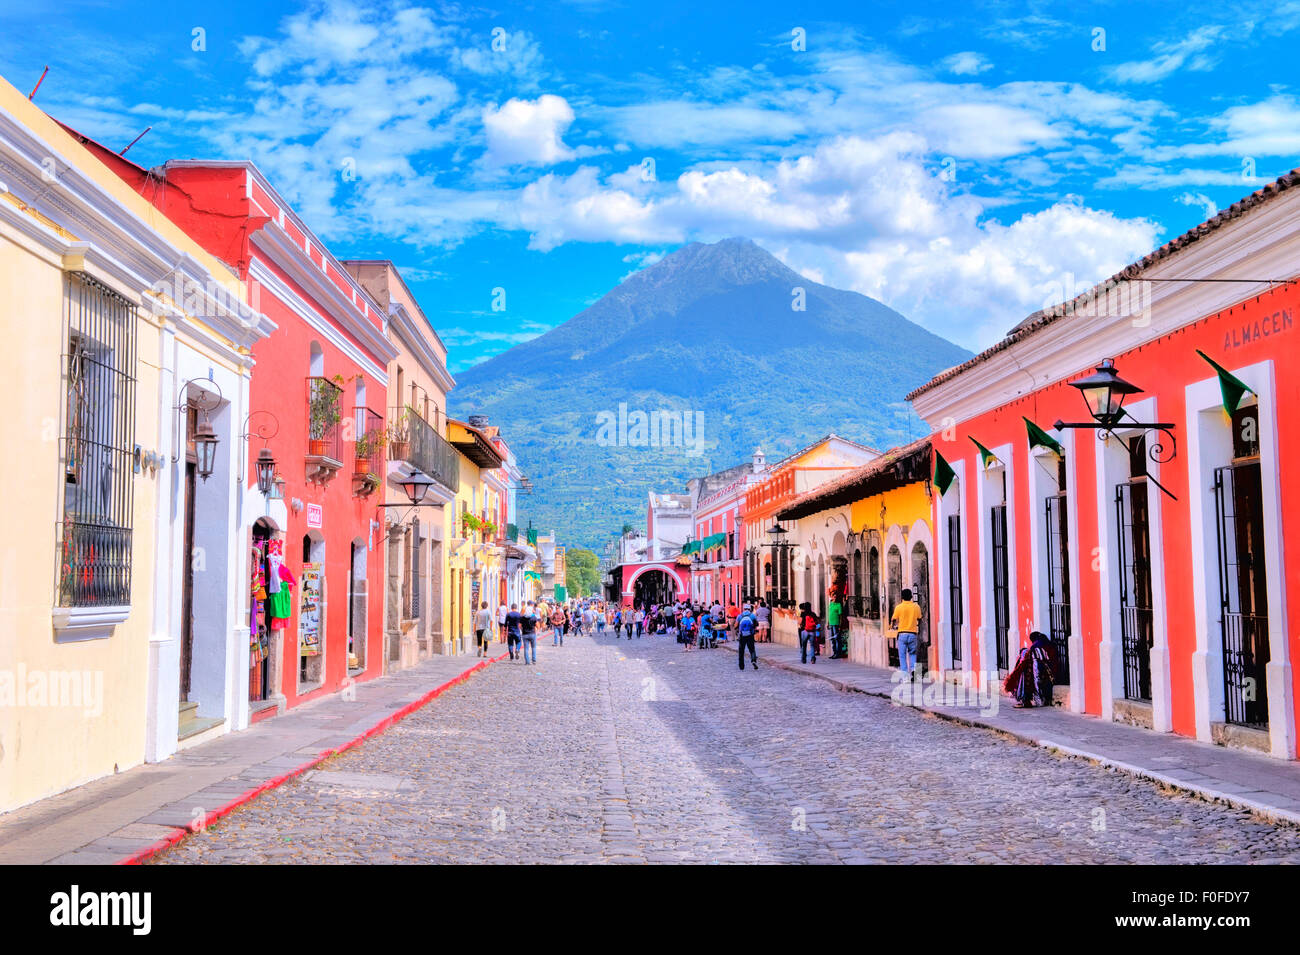 Street view of Antigua Guatemala - Stock Image